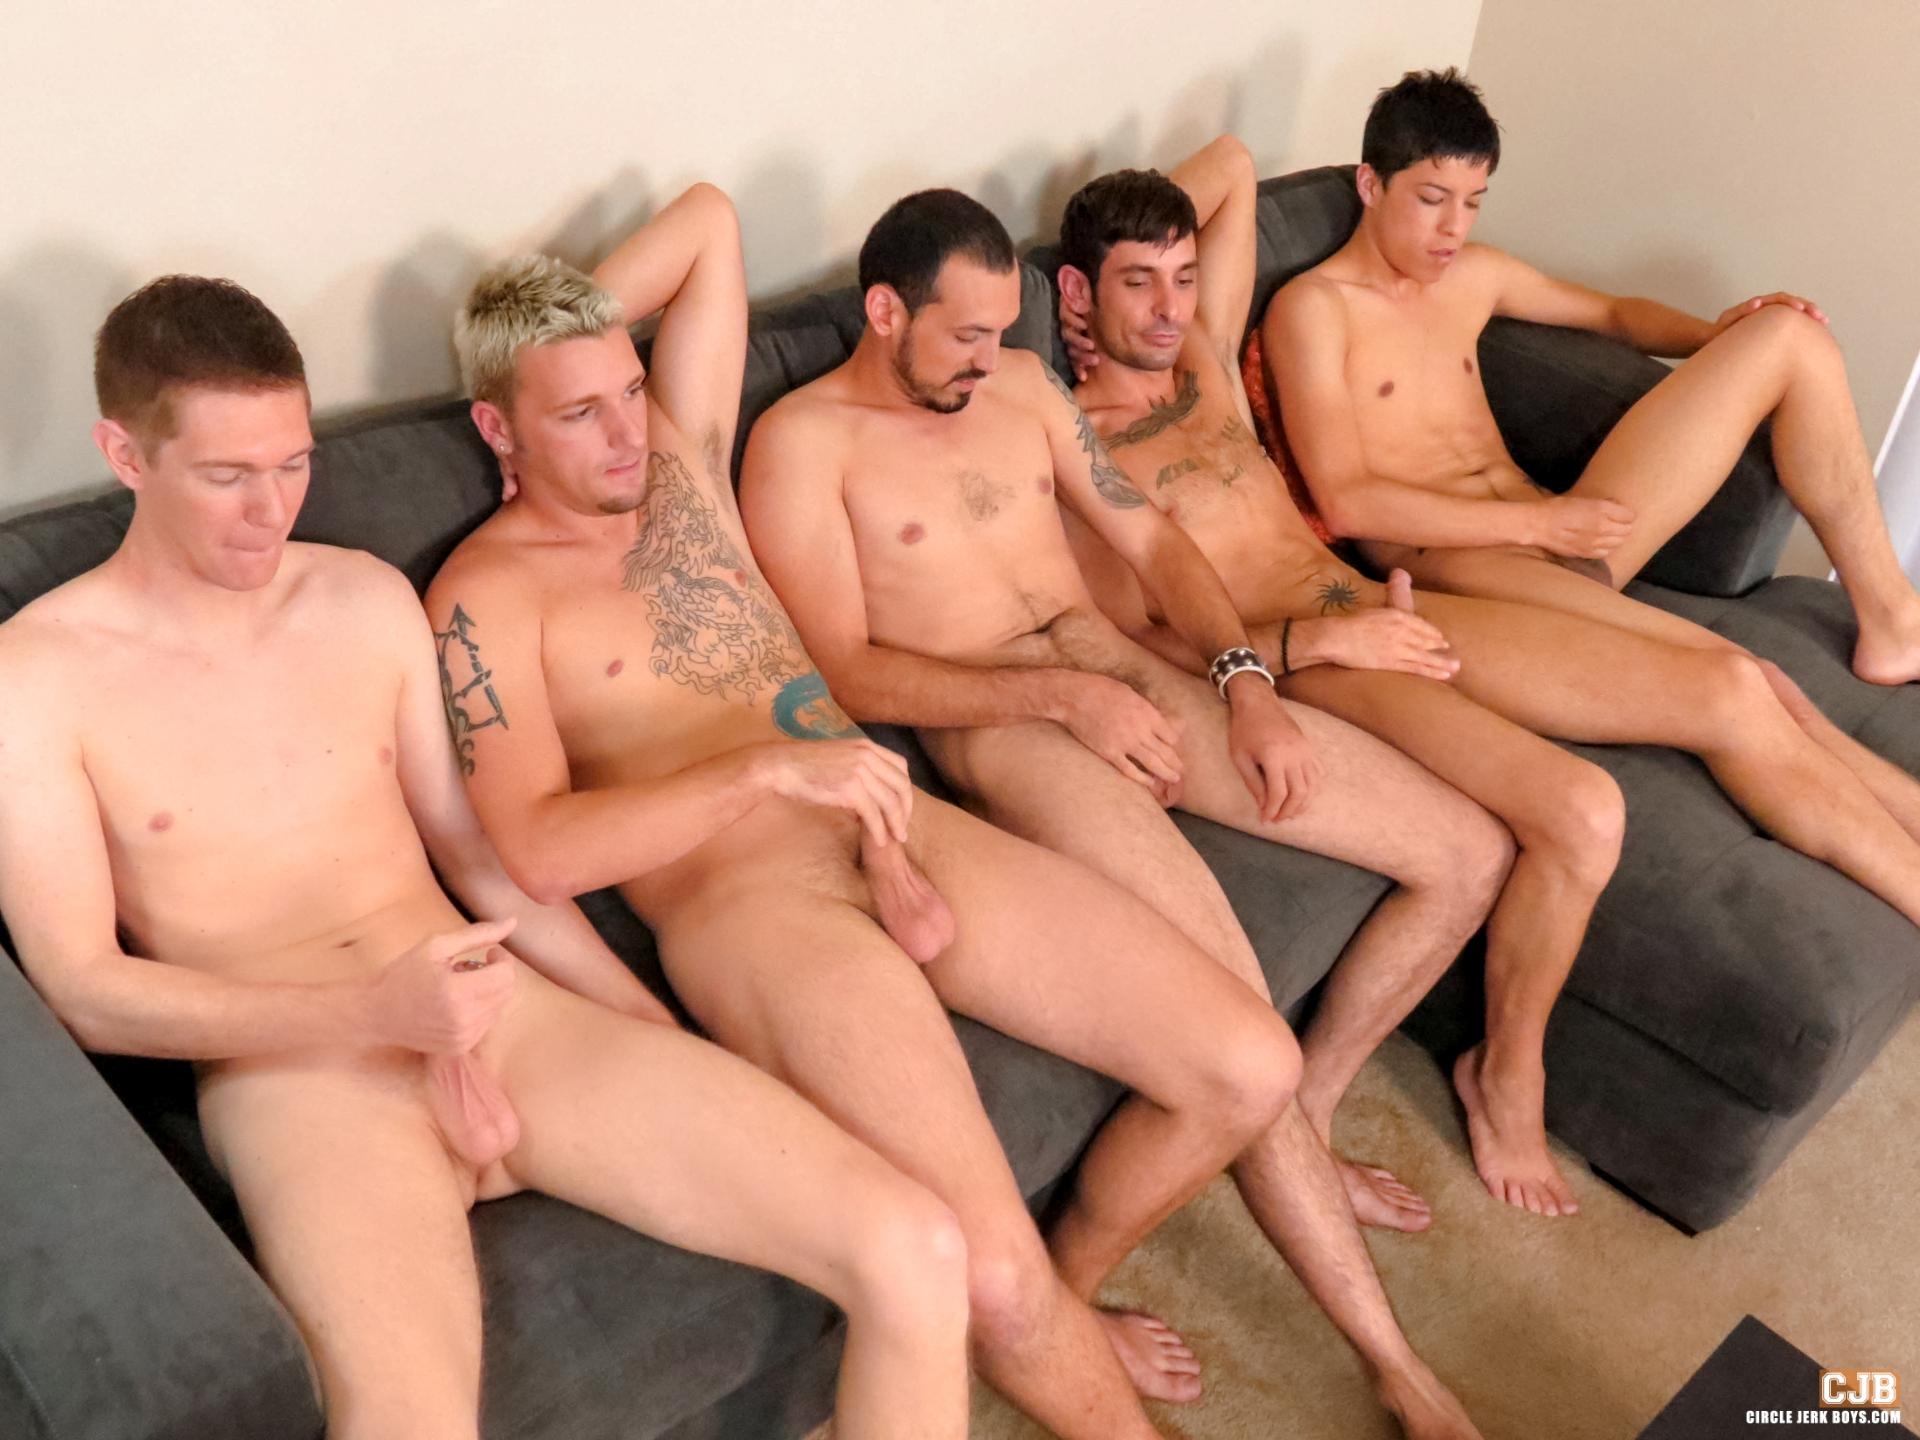 Ребята дрочат своими руками 9 фотография